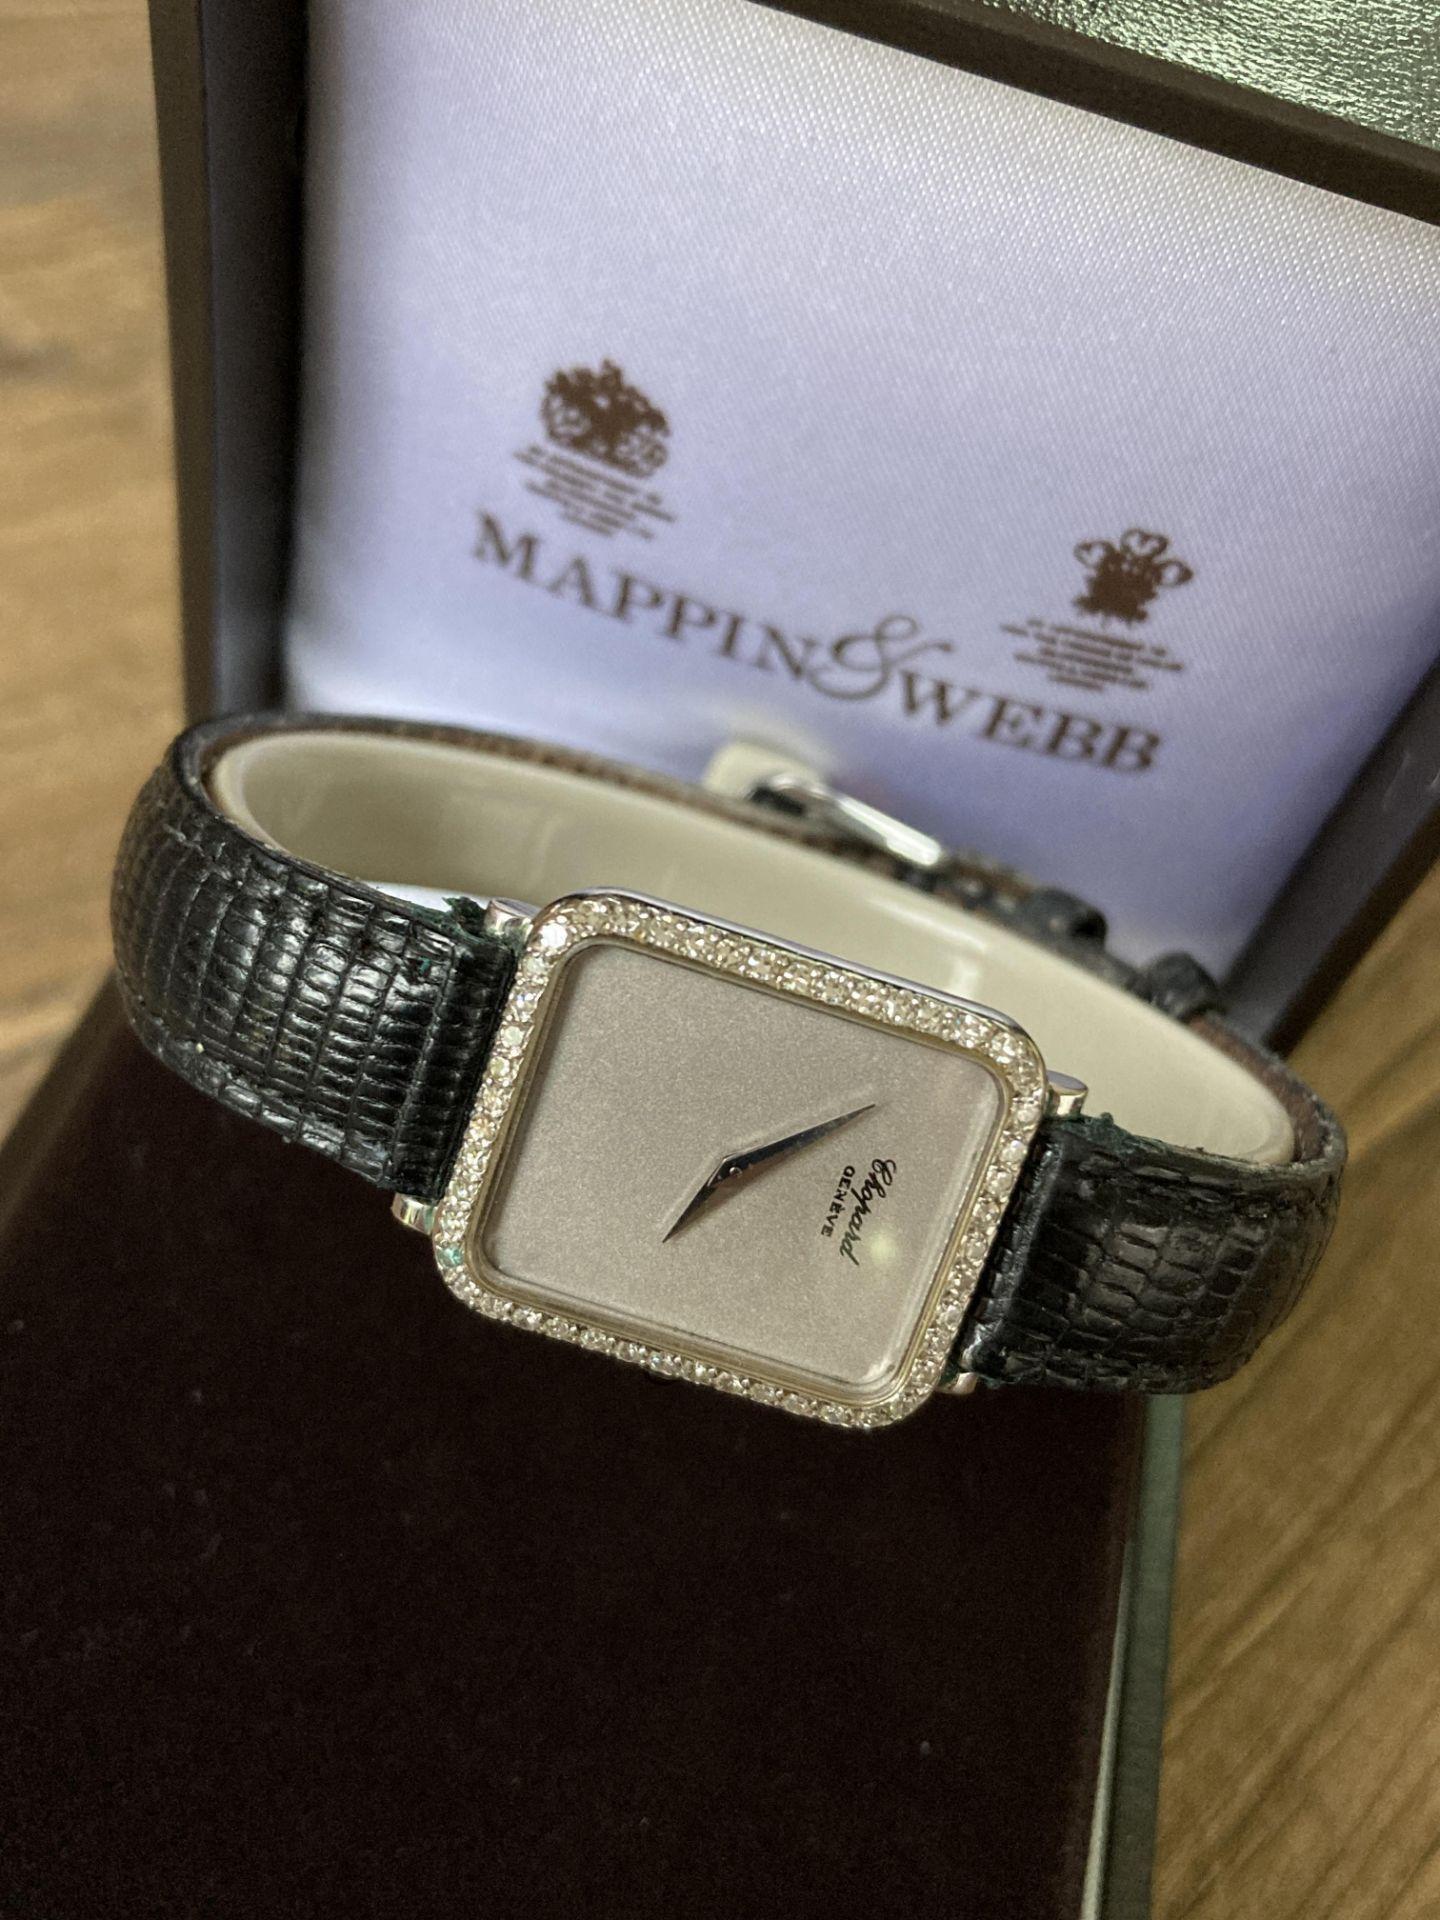 DIAMOND SET CHOPARD WATCH - WHITE GOLD, 20MM